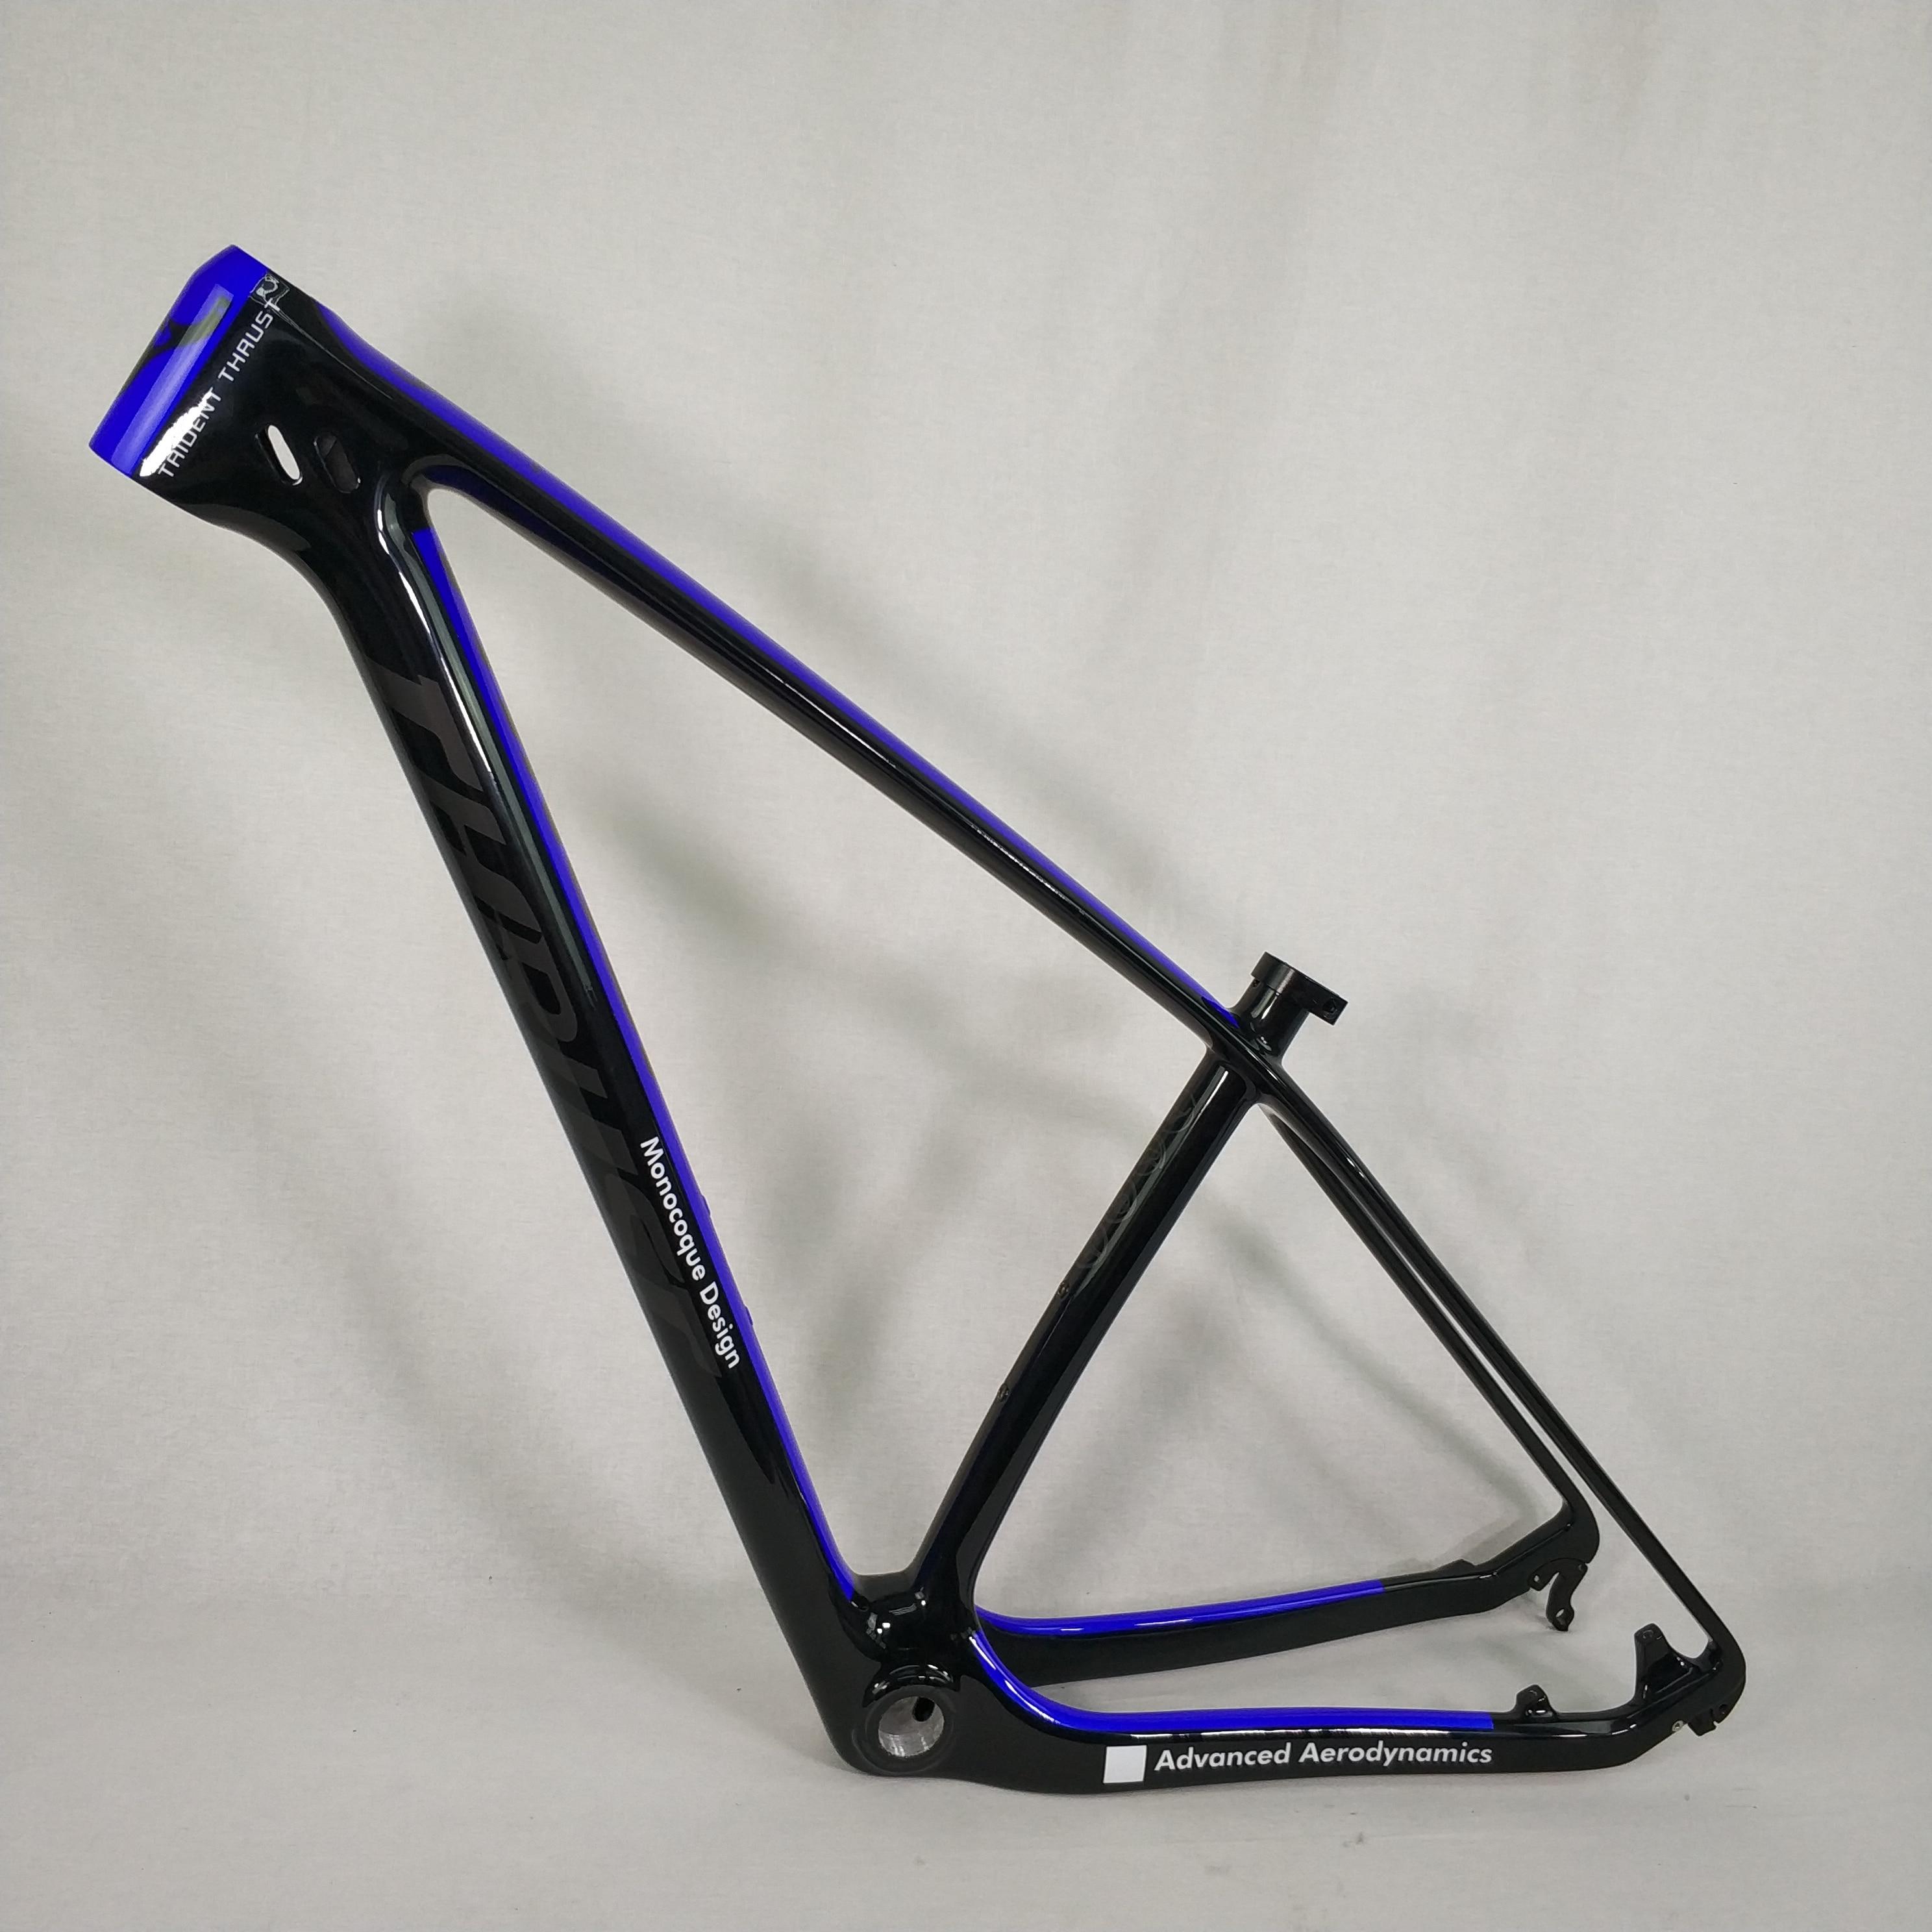 "T800 Toray Carbon Fiber 29ER Mountain Bike Bicycle MTB Cycling Frame 19/"" BSA"